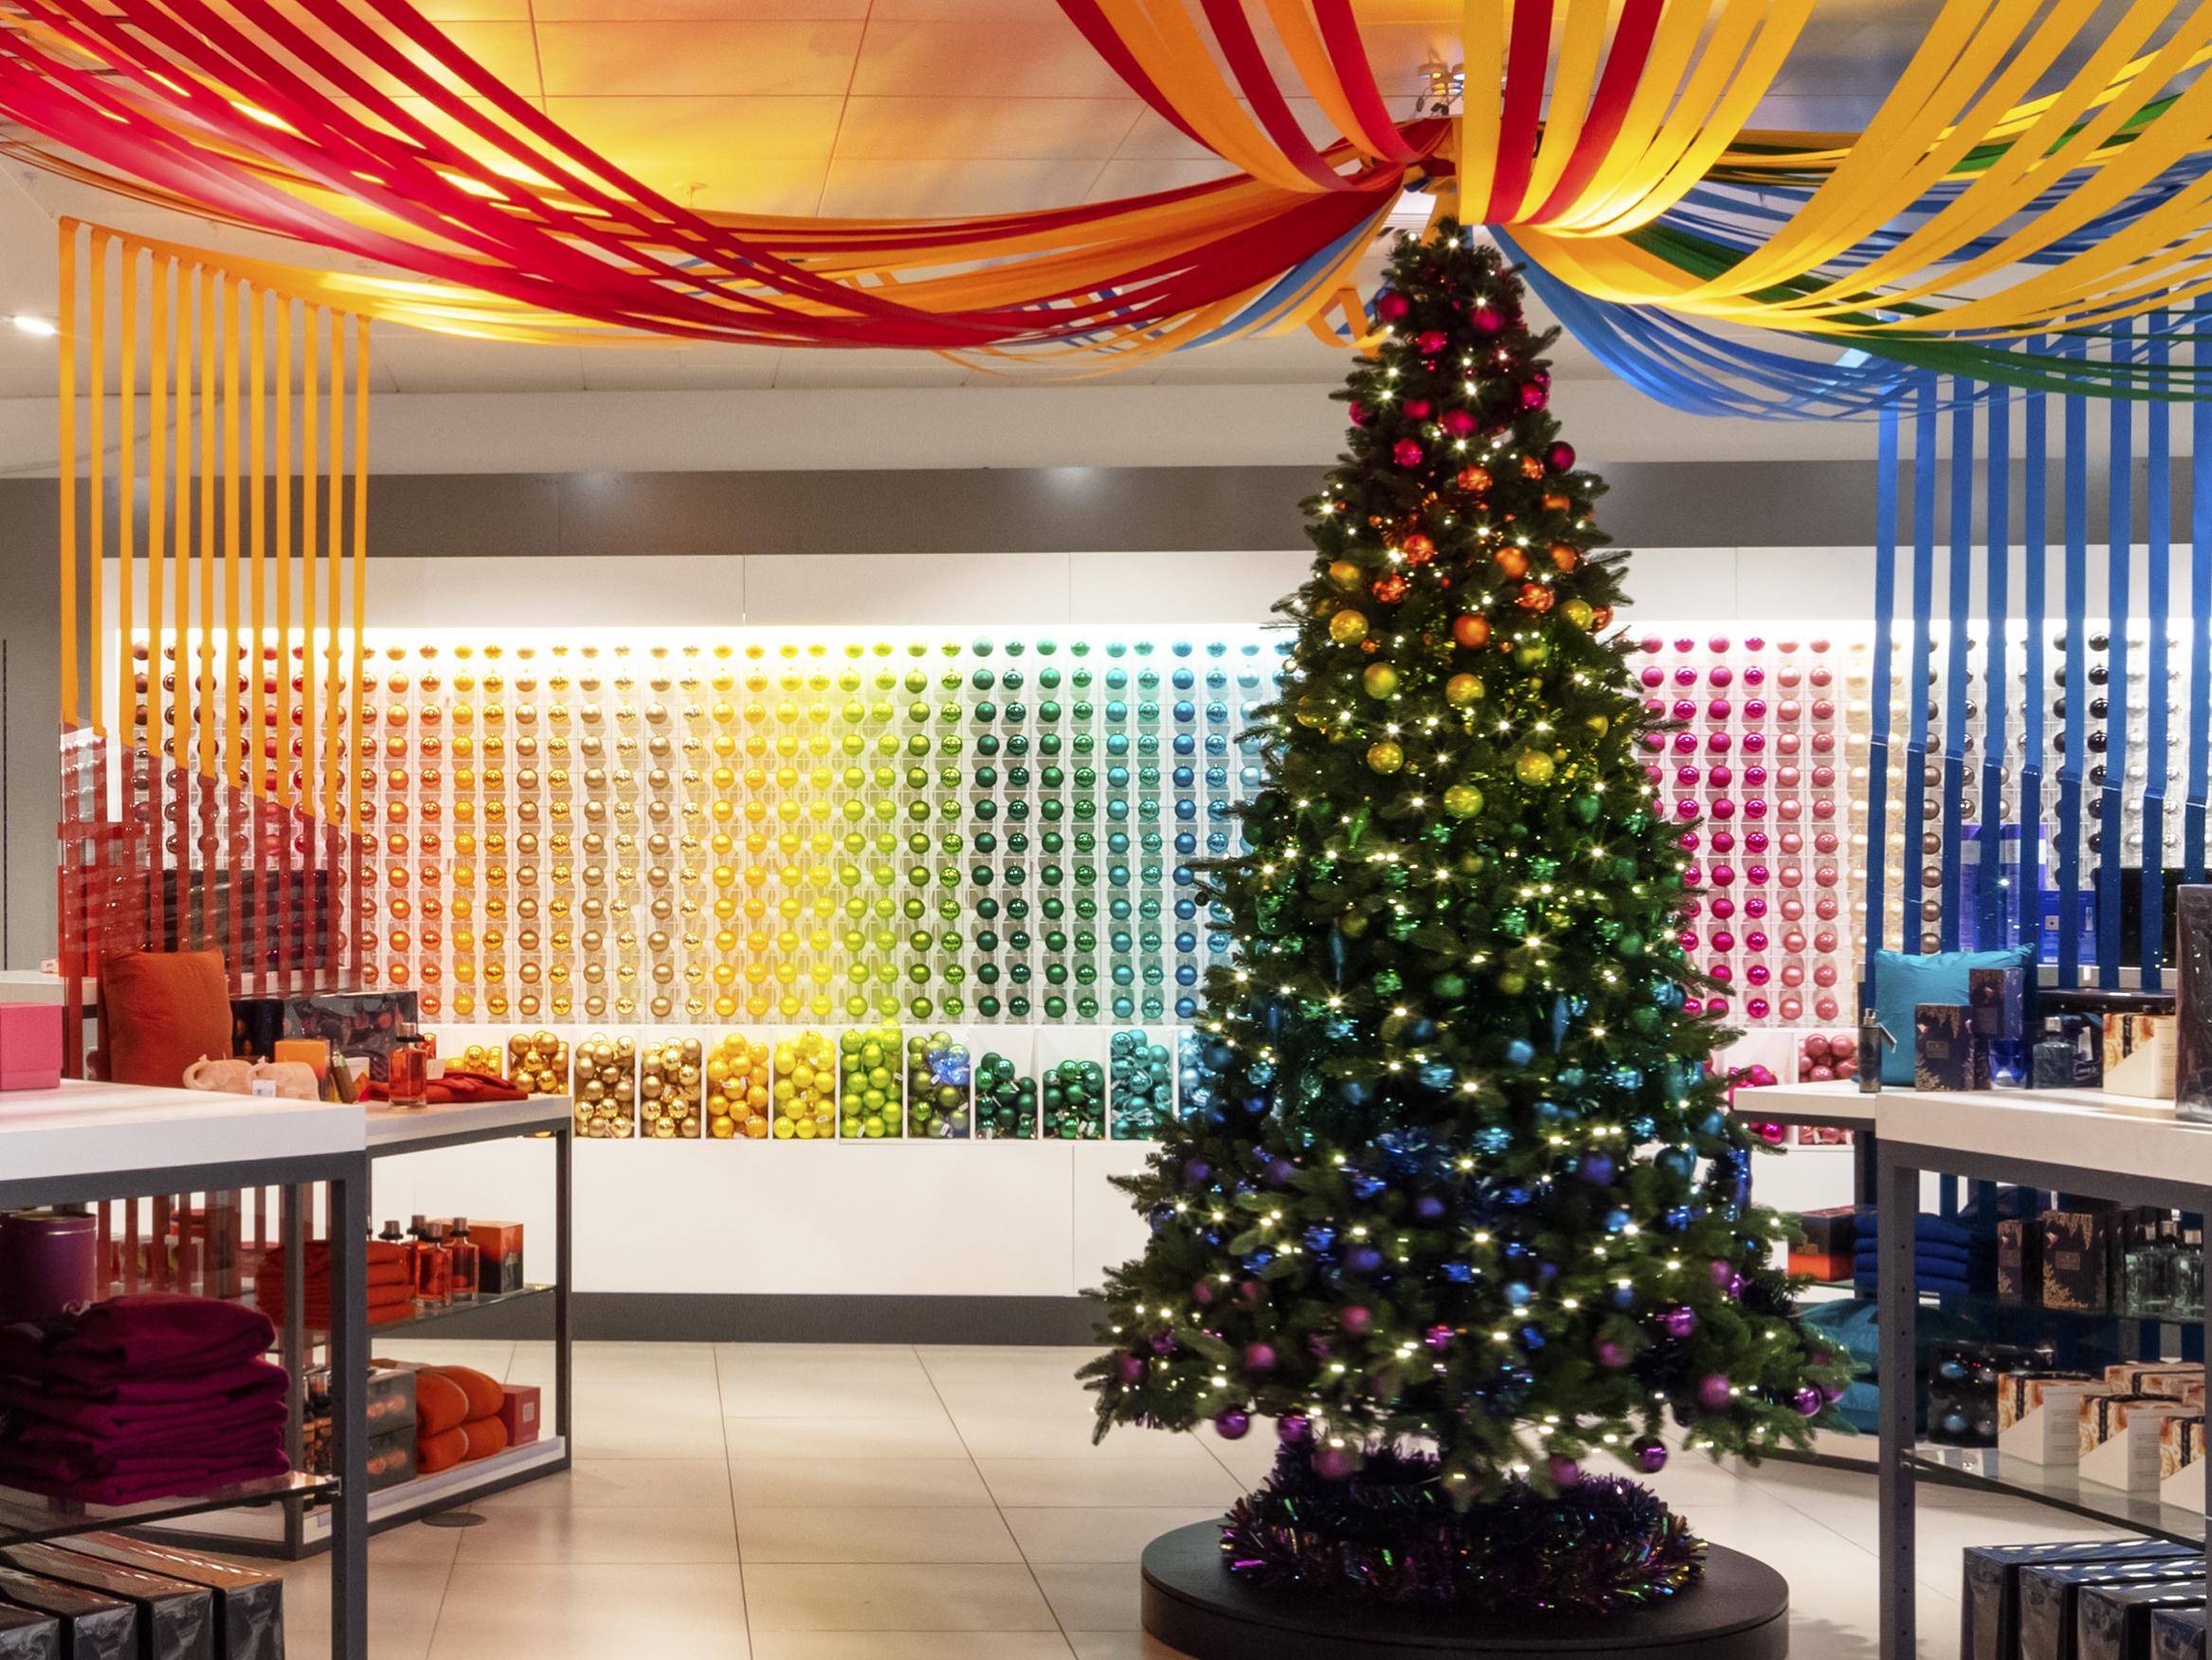 In-Store Christmas Display 4 | Prop Studios | Formroom | John Lewis Christmas